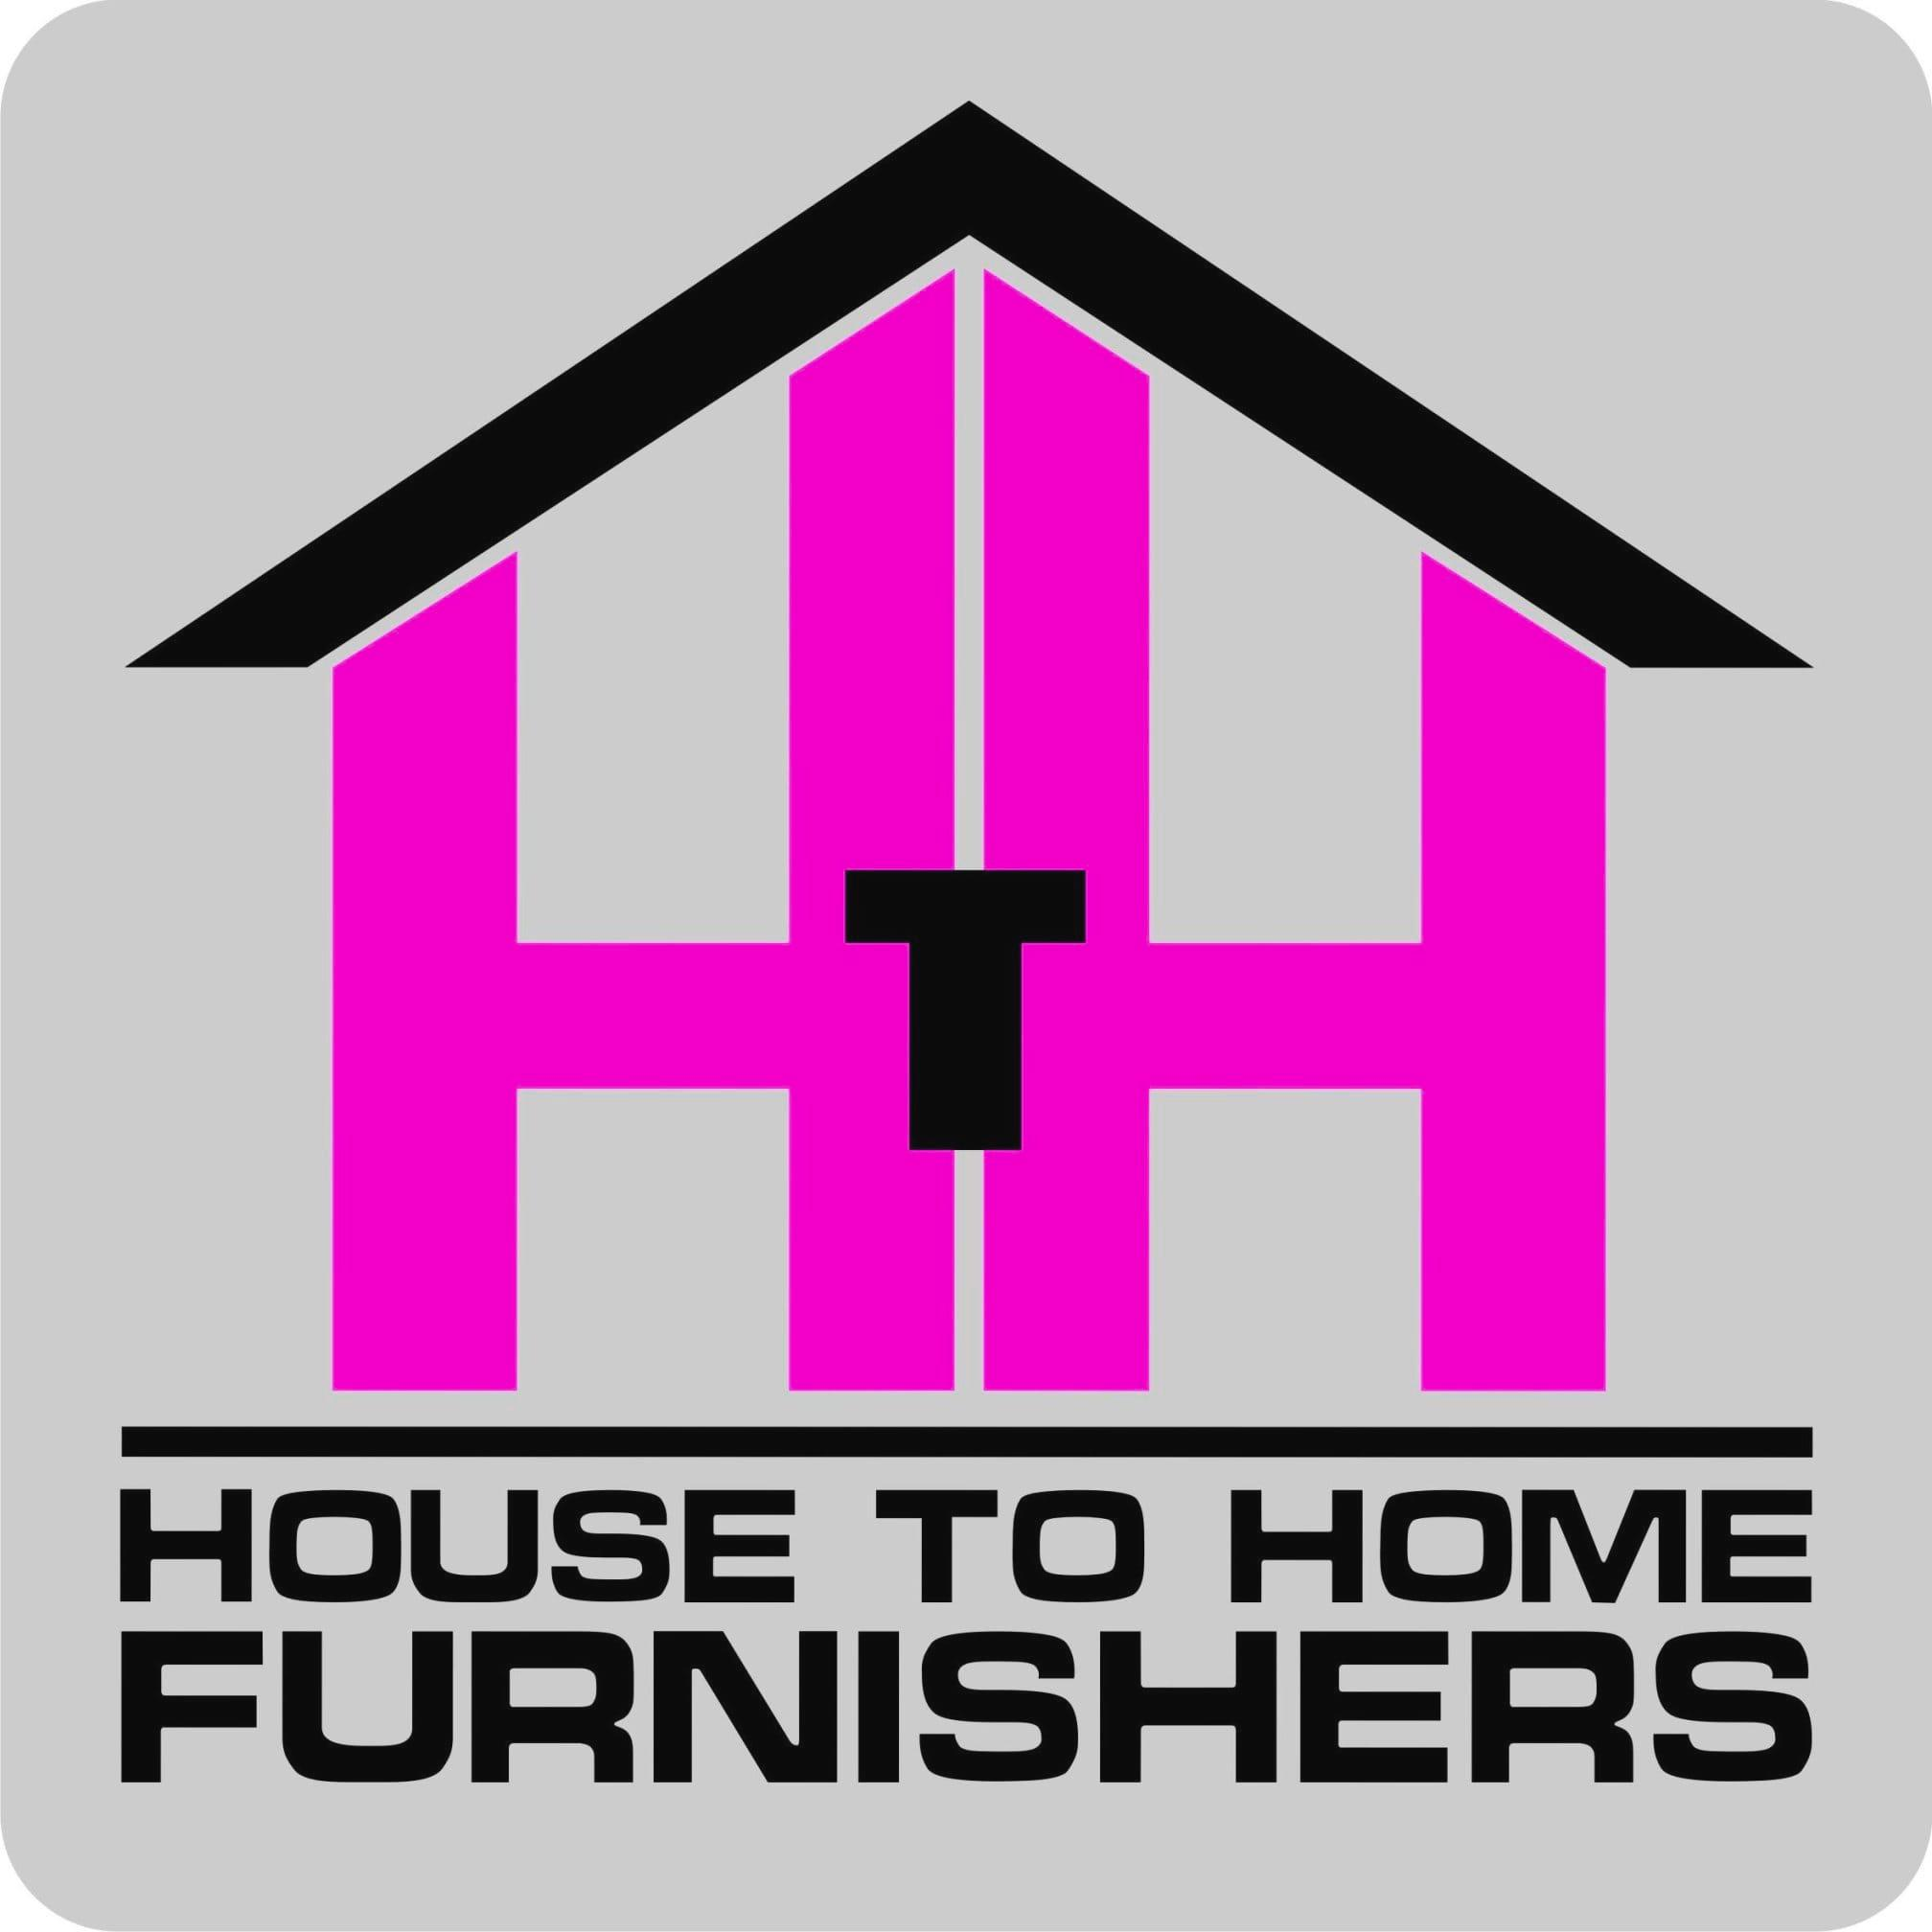 House to Home Furnishers - Stranraer, Dumfriesshire DG9 7DD - 01776 705888 | ShowMeLocal.com